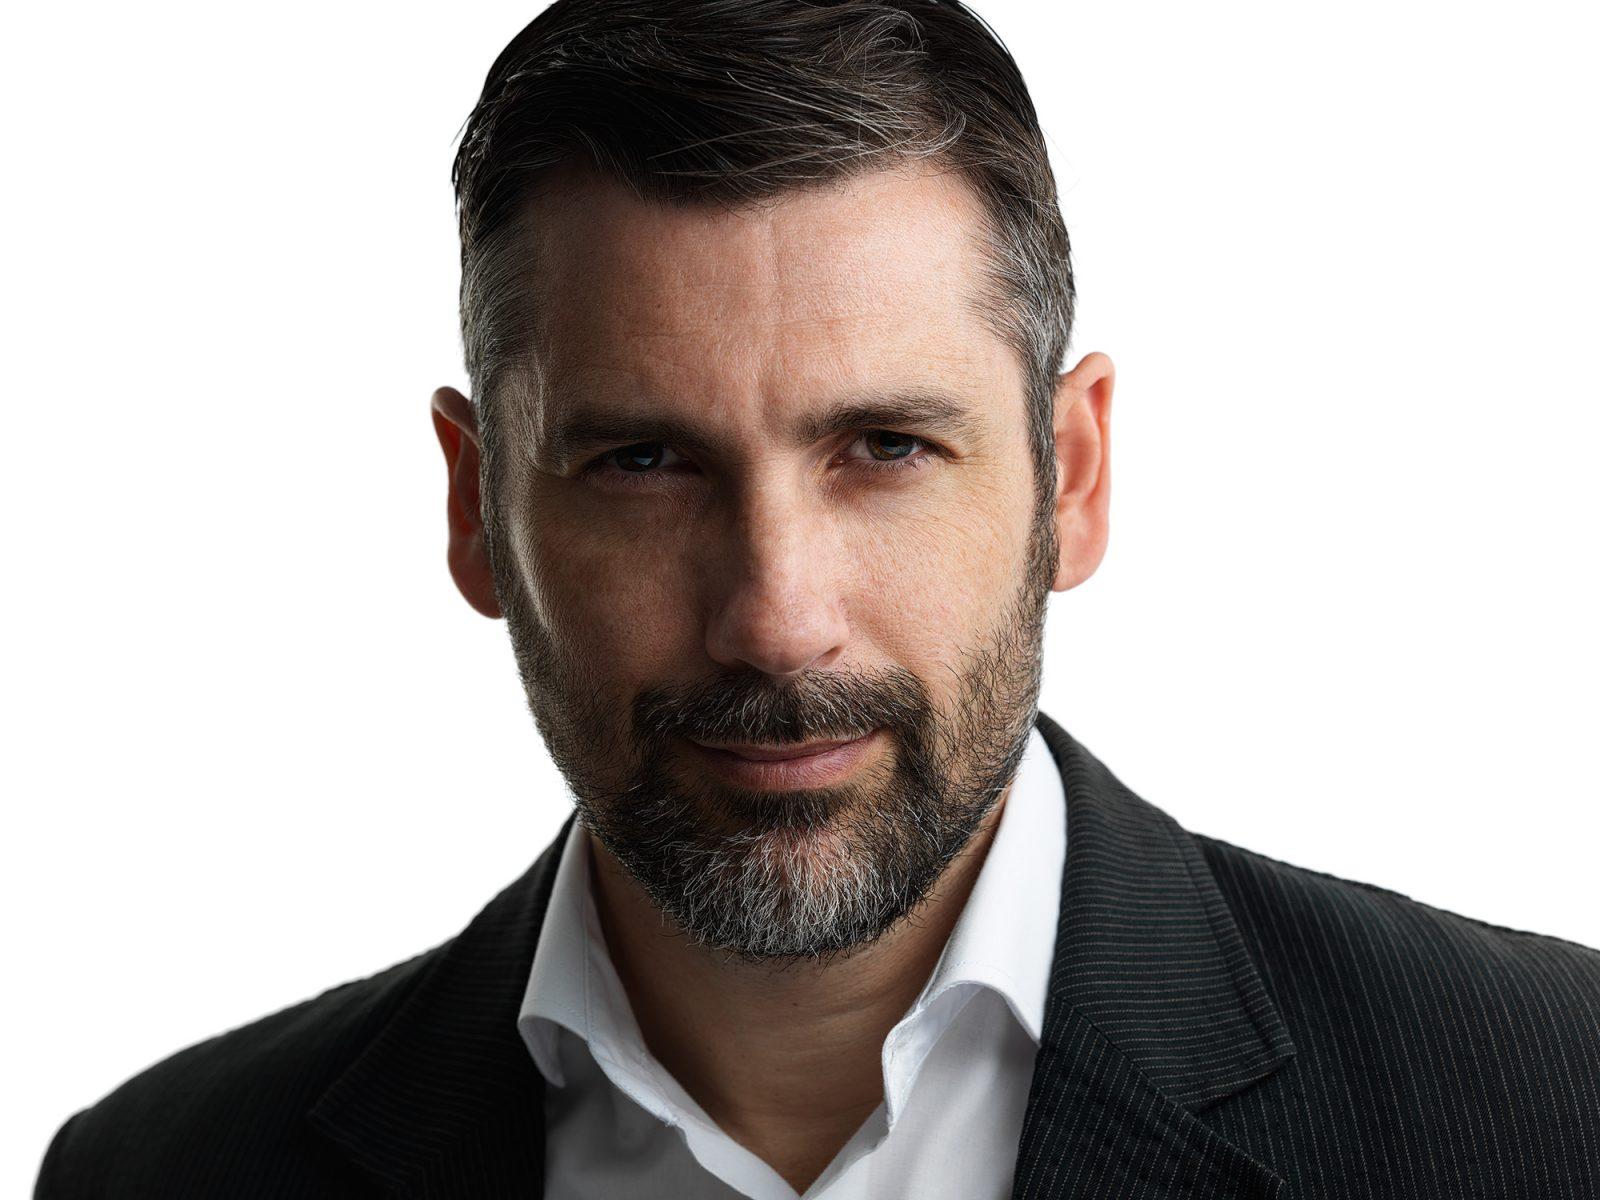 headshot true Montreal, HP Vadim Daniel, Montreal profile photographer, linkedin headshot montreal